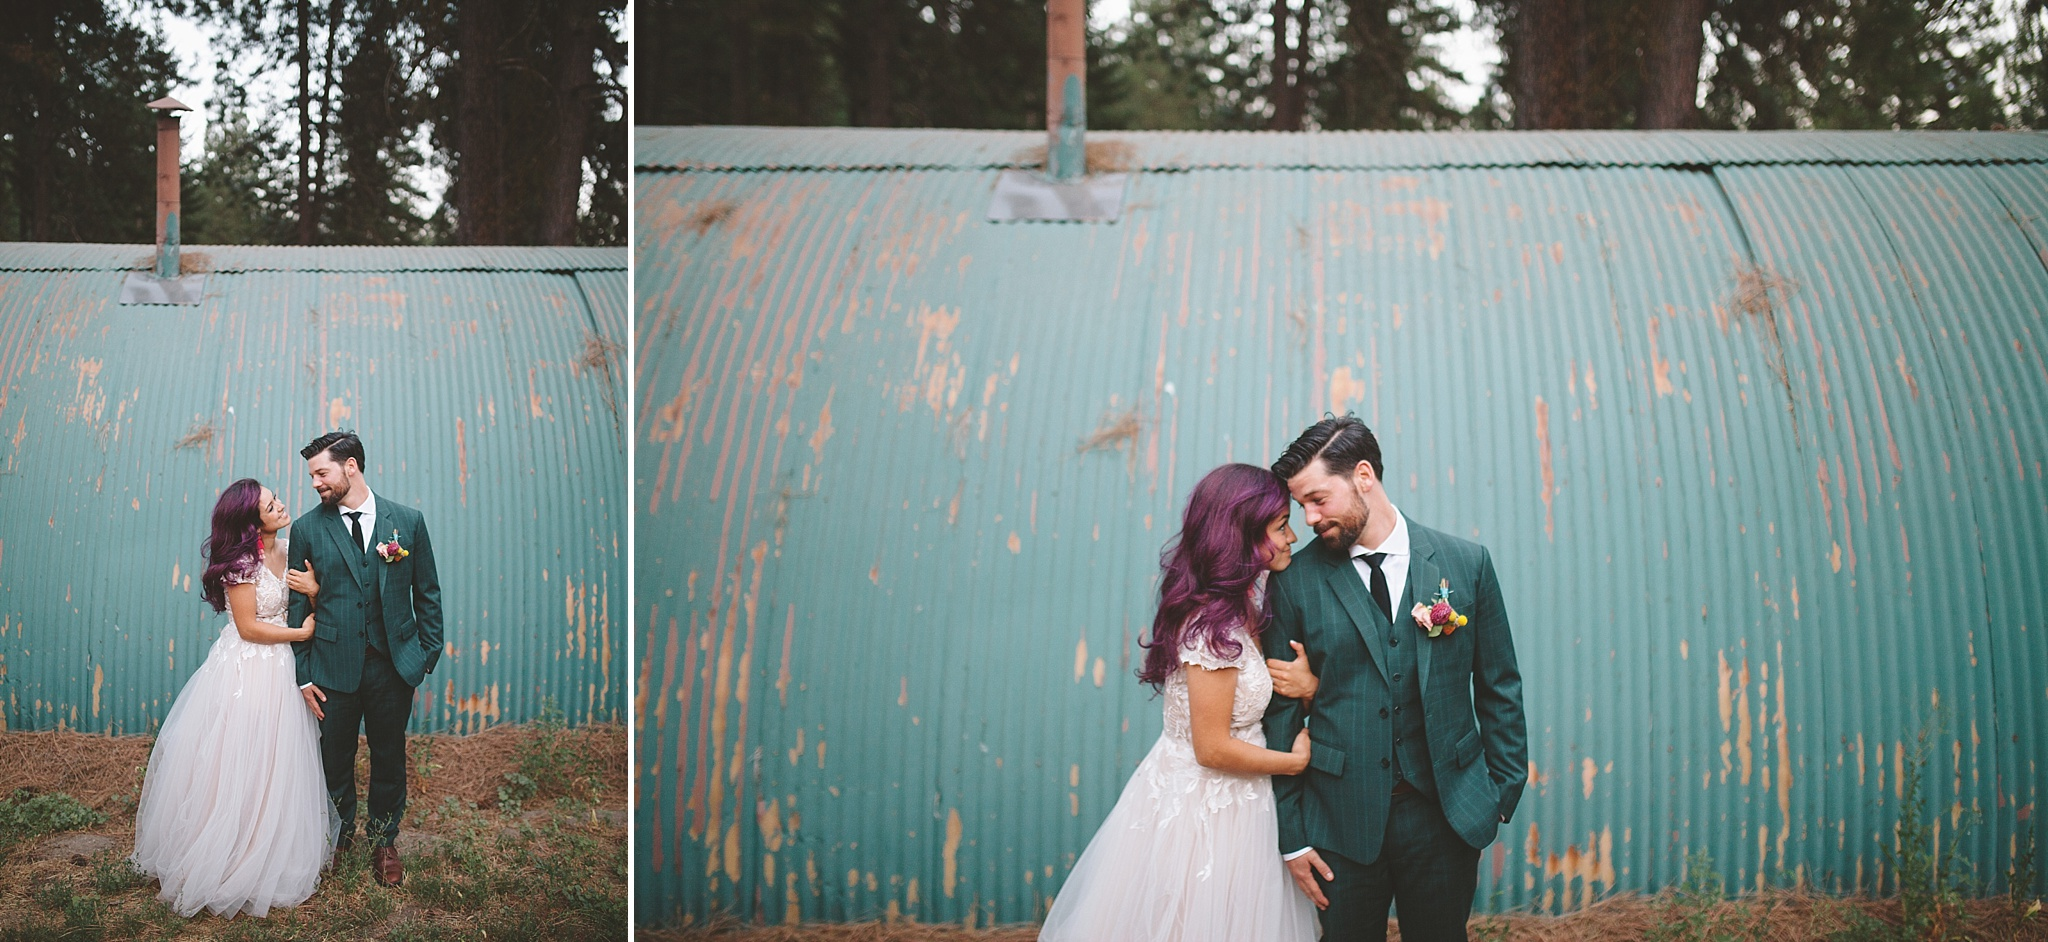 colorful wedding portraits in washington